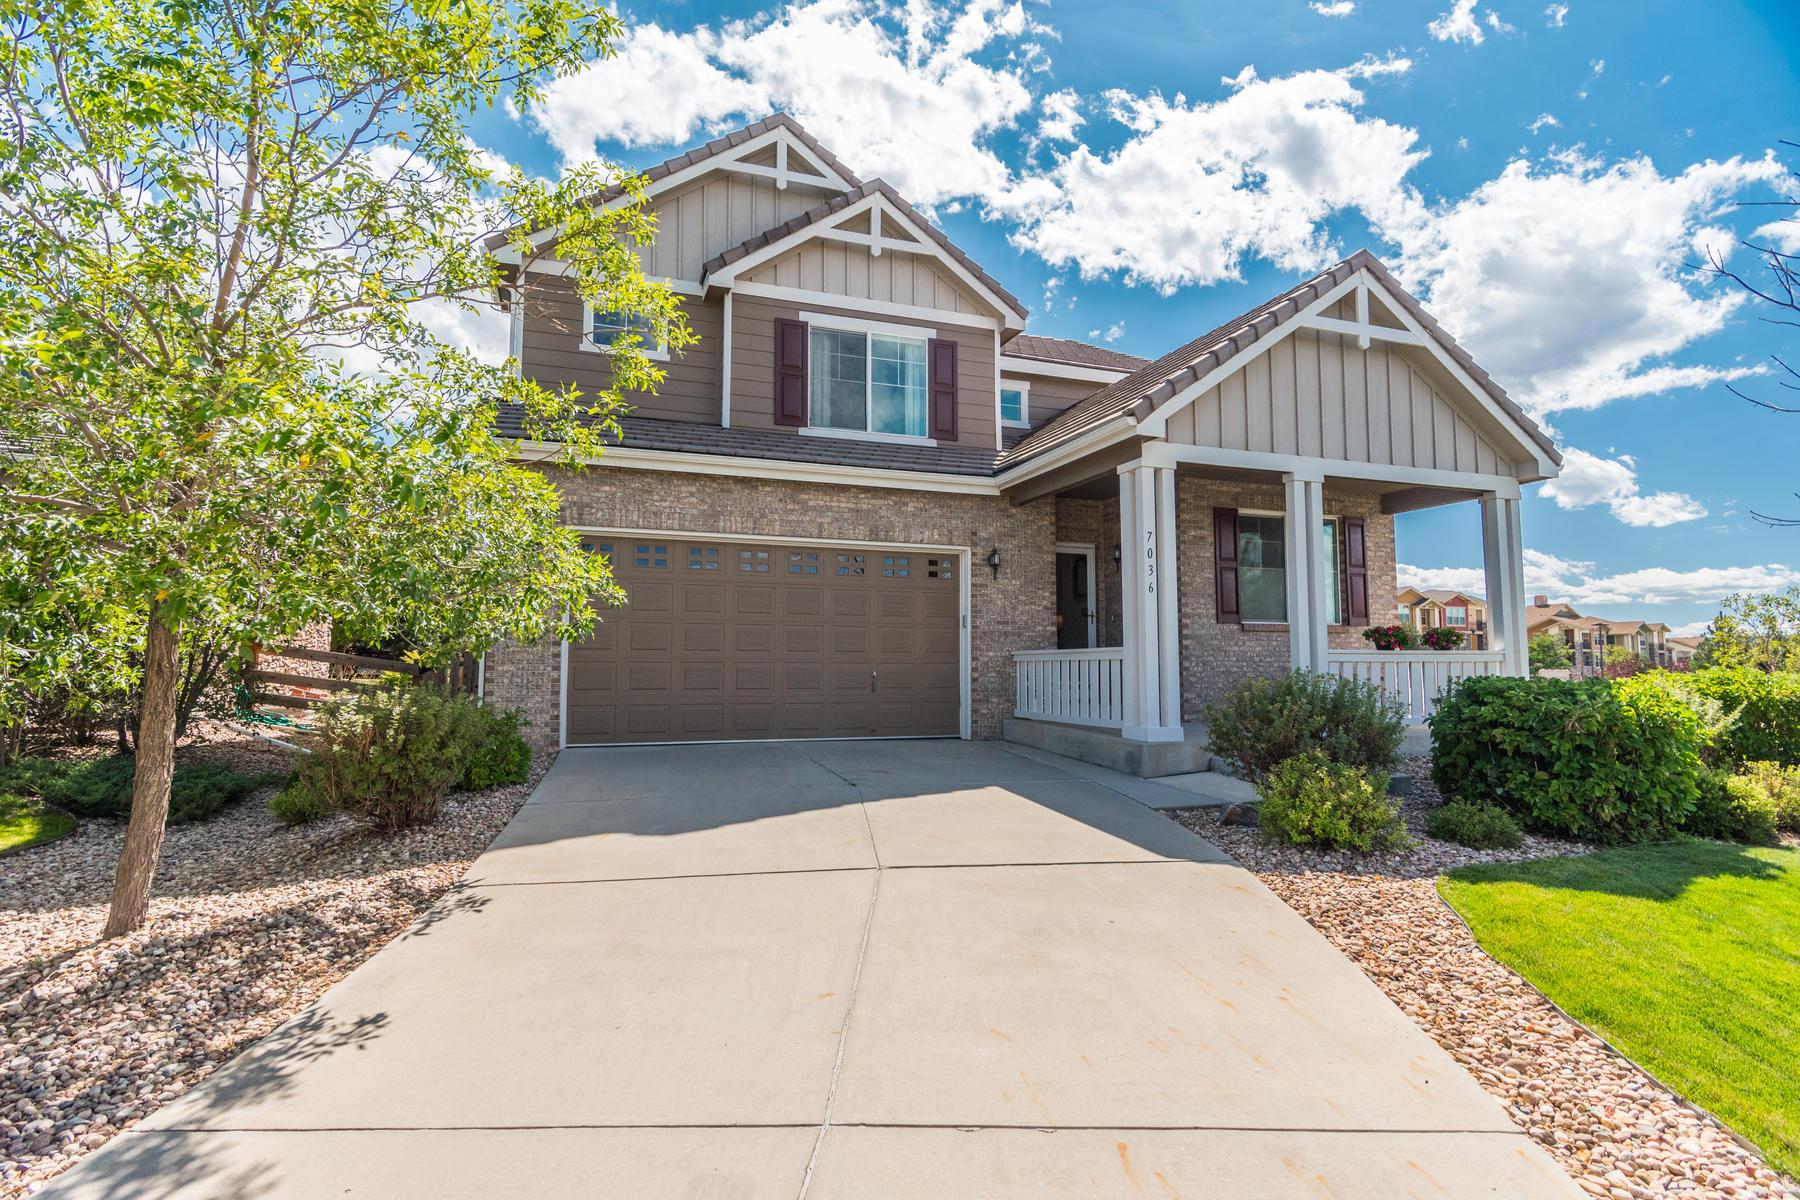 Single Family Homes for Sale at 7036 S Gun Club Court 7036 S Gun Club Ct Aurora, Colorado 80016 United States